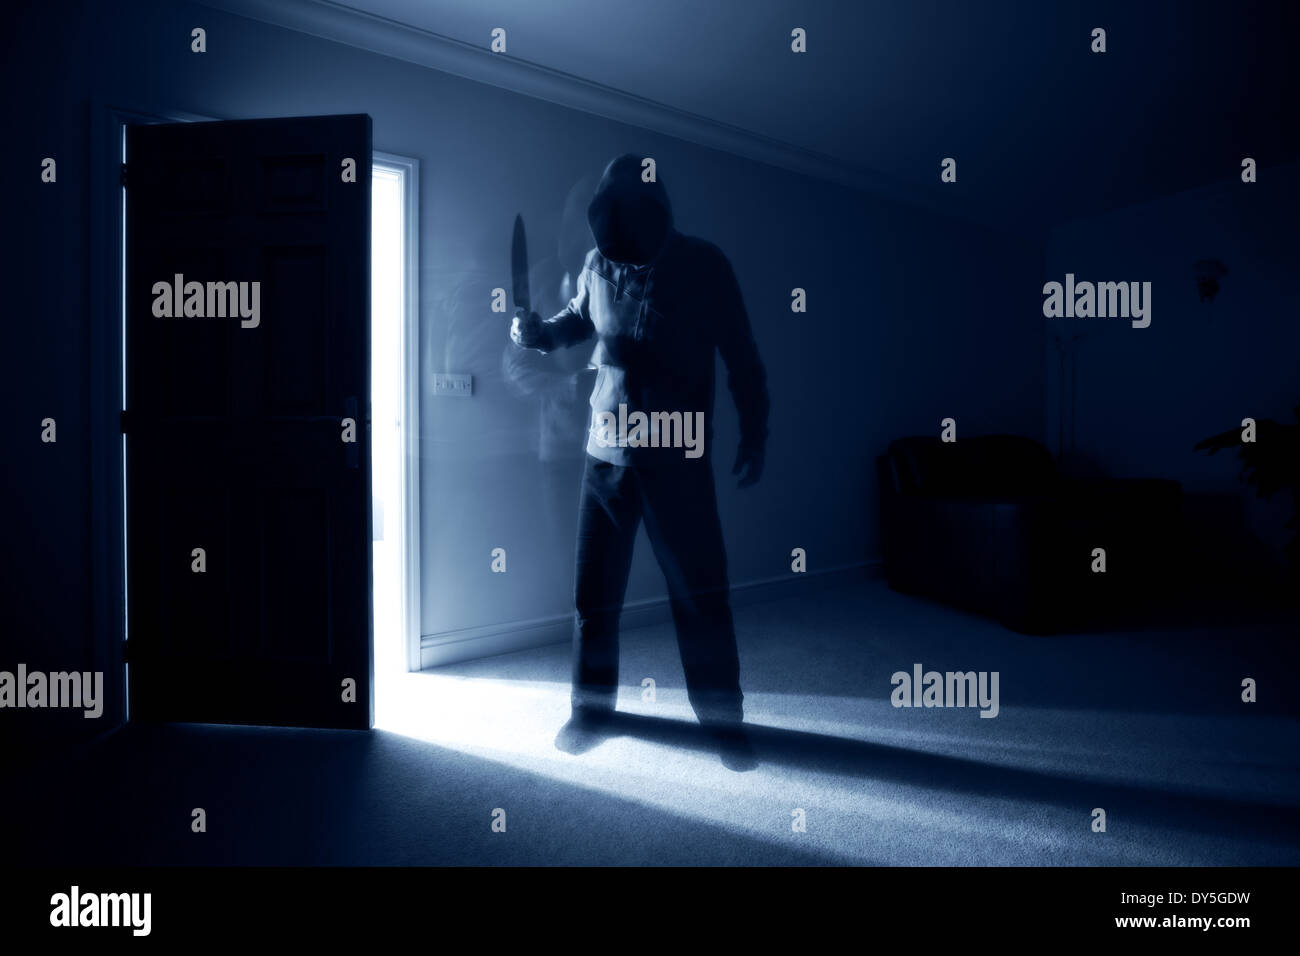 Burglar with knife - Stock Image